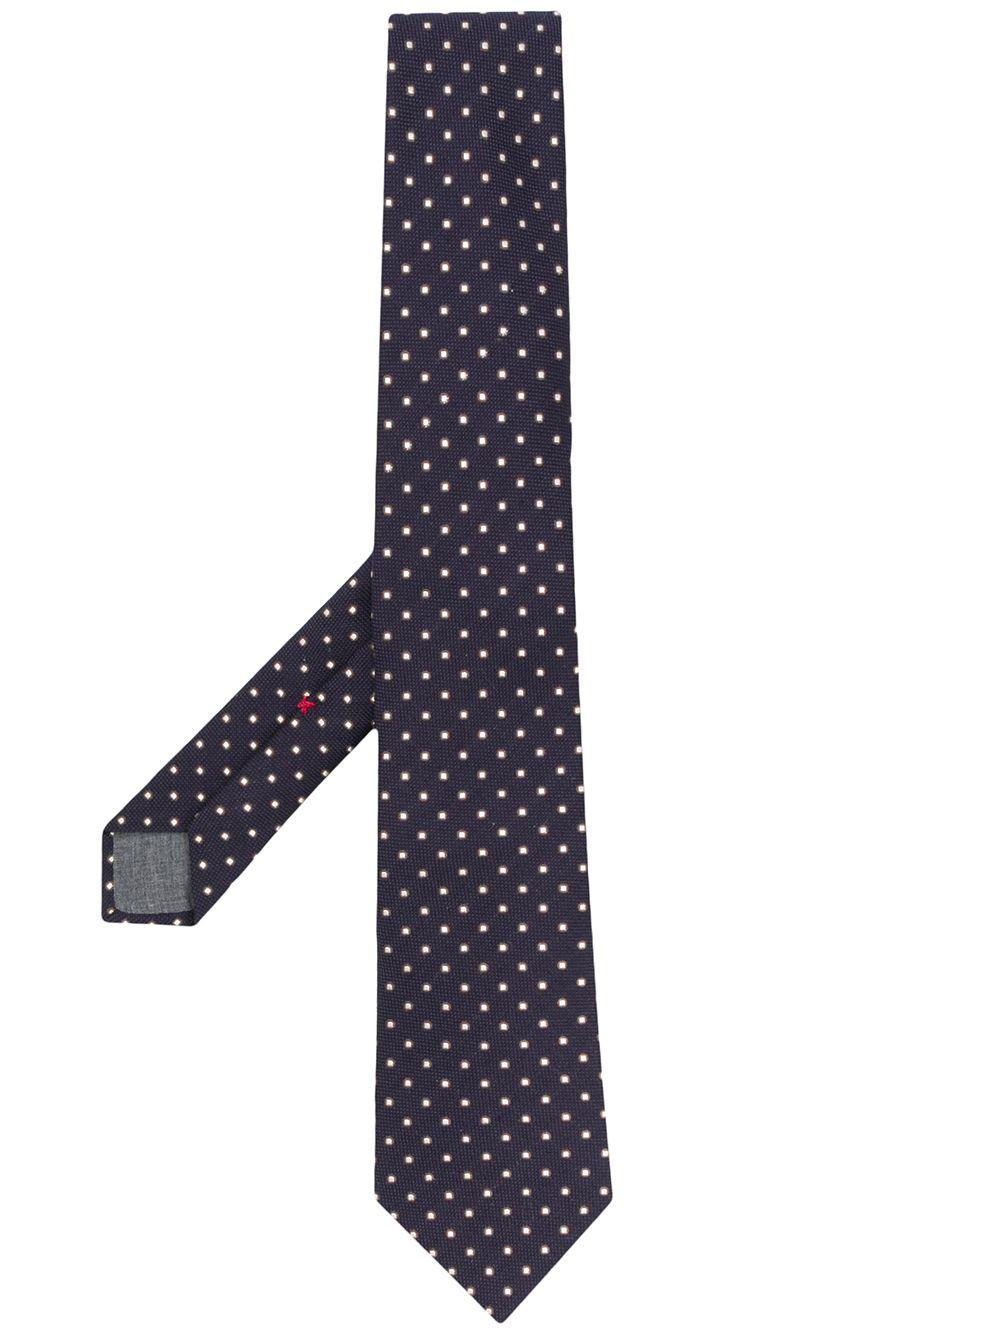 Wool Silk Blend Tie